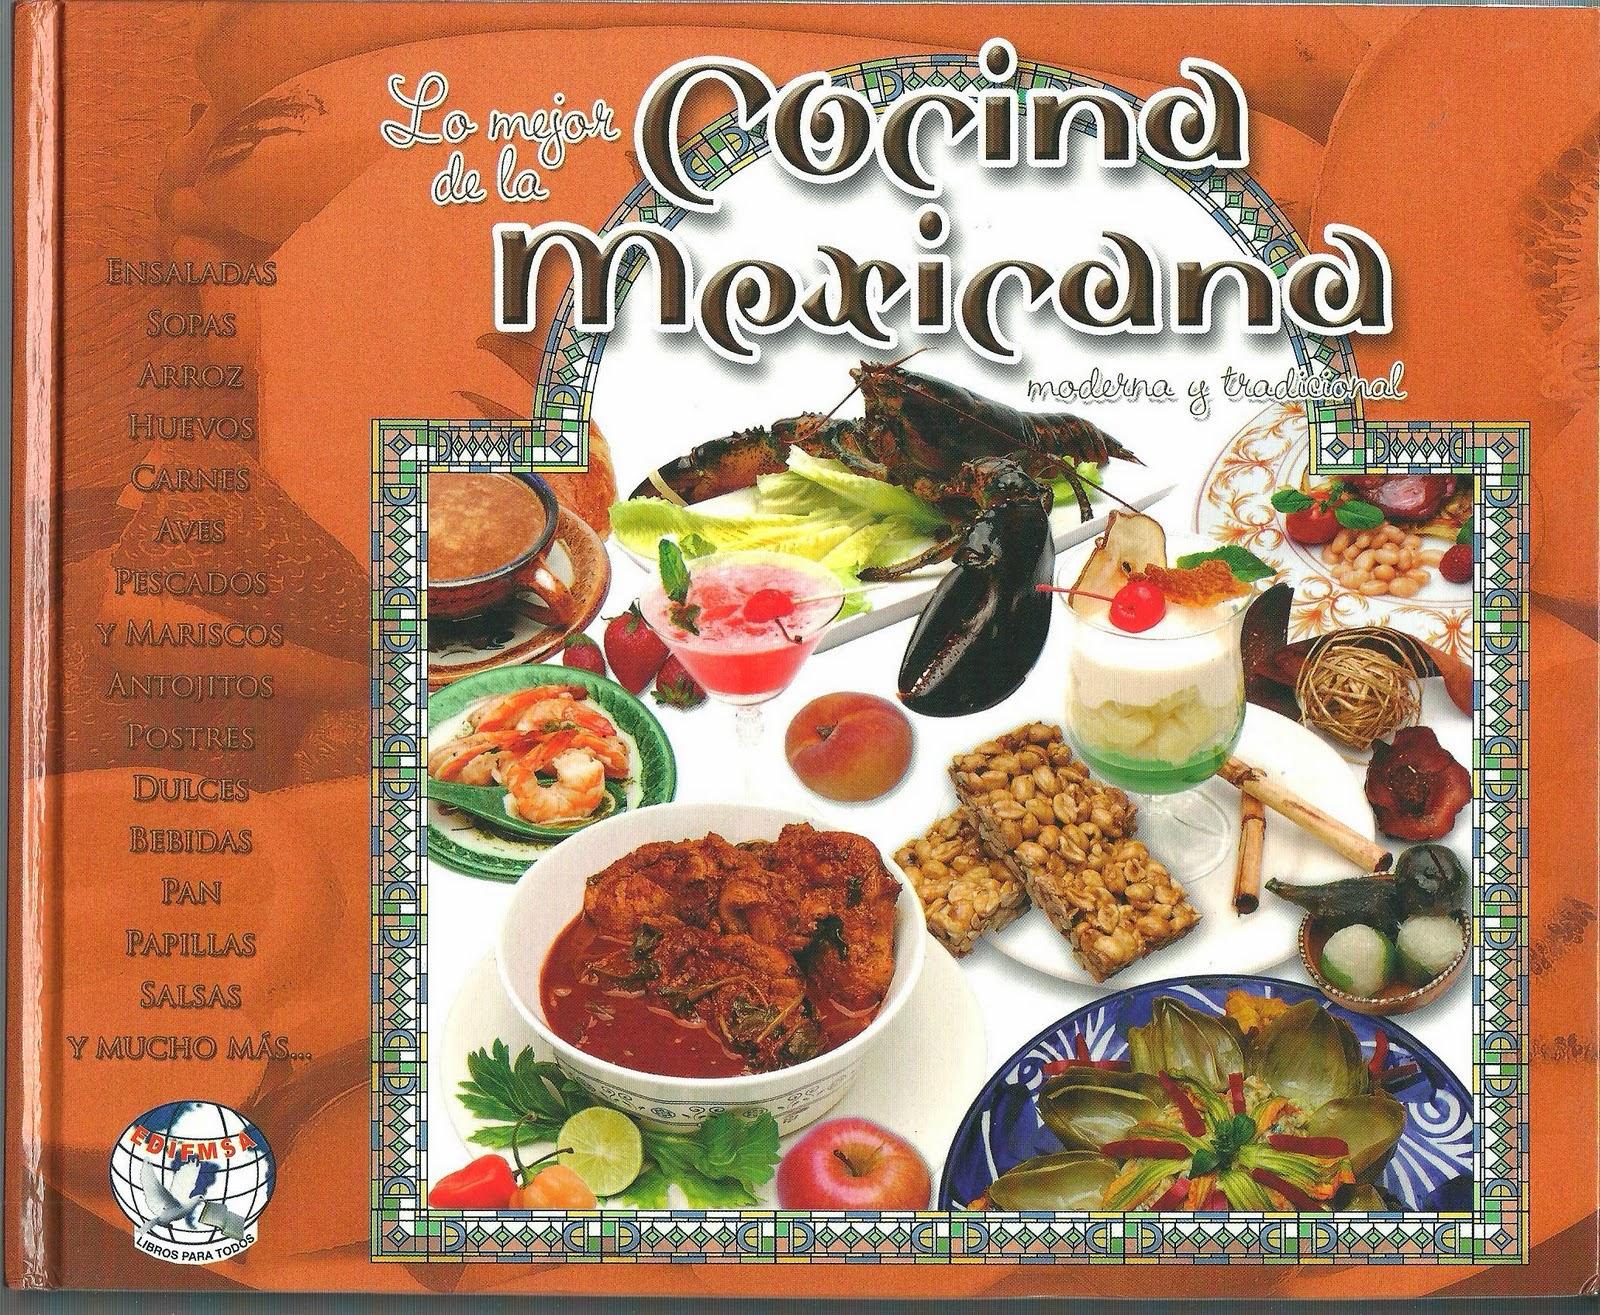 Noticias del aula virtual de educagratis curso de cocina for Cocina tradicional